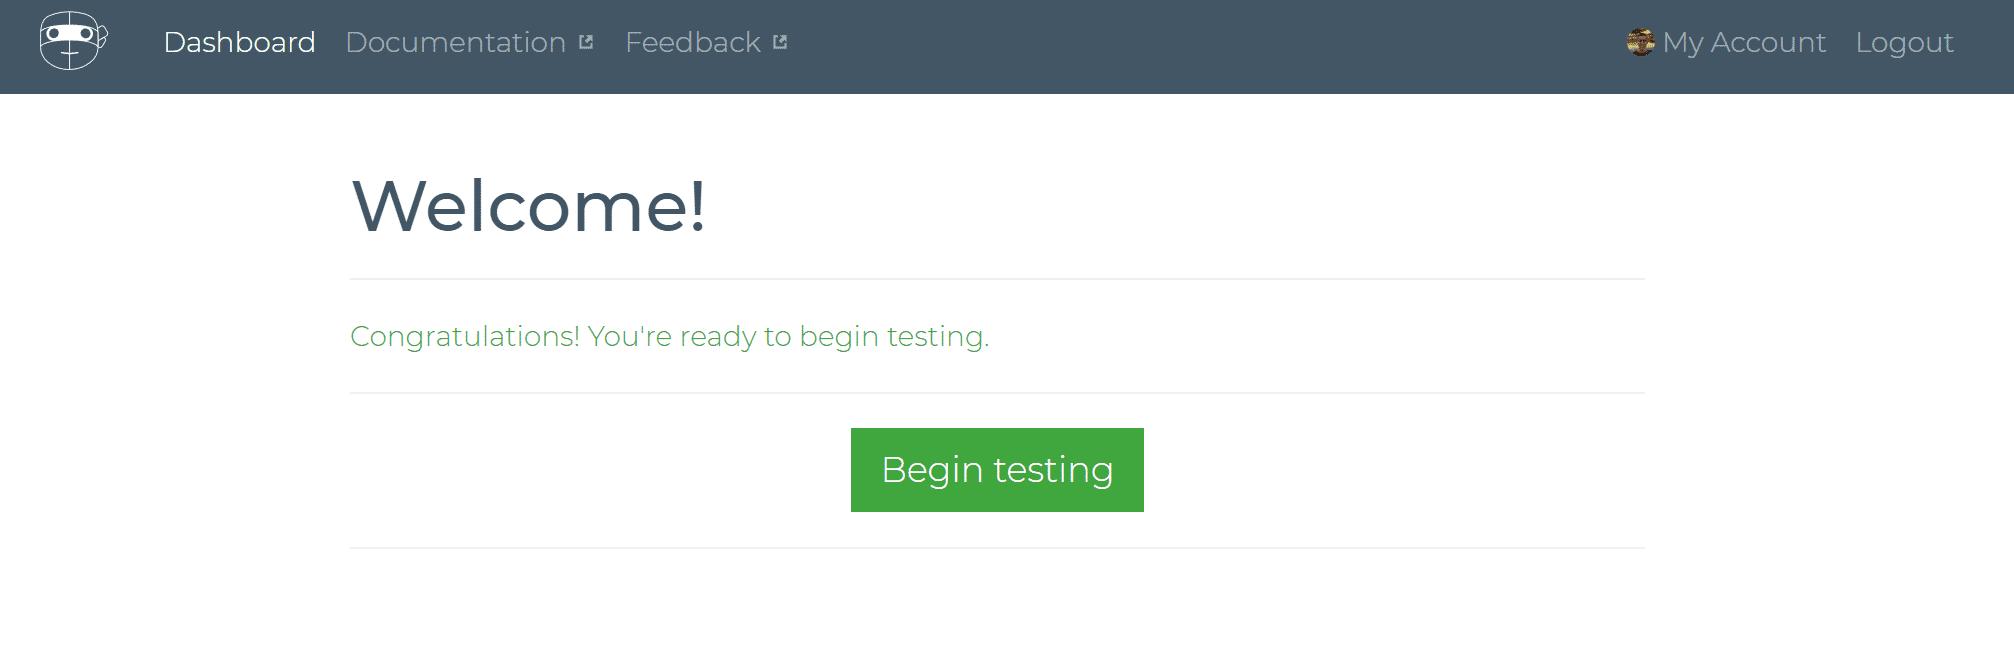 Begin testing Robot Ninja